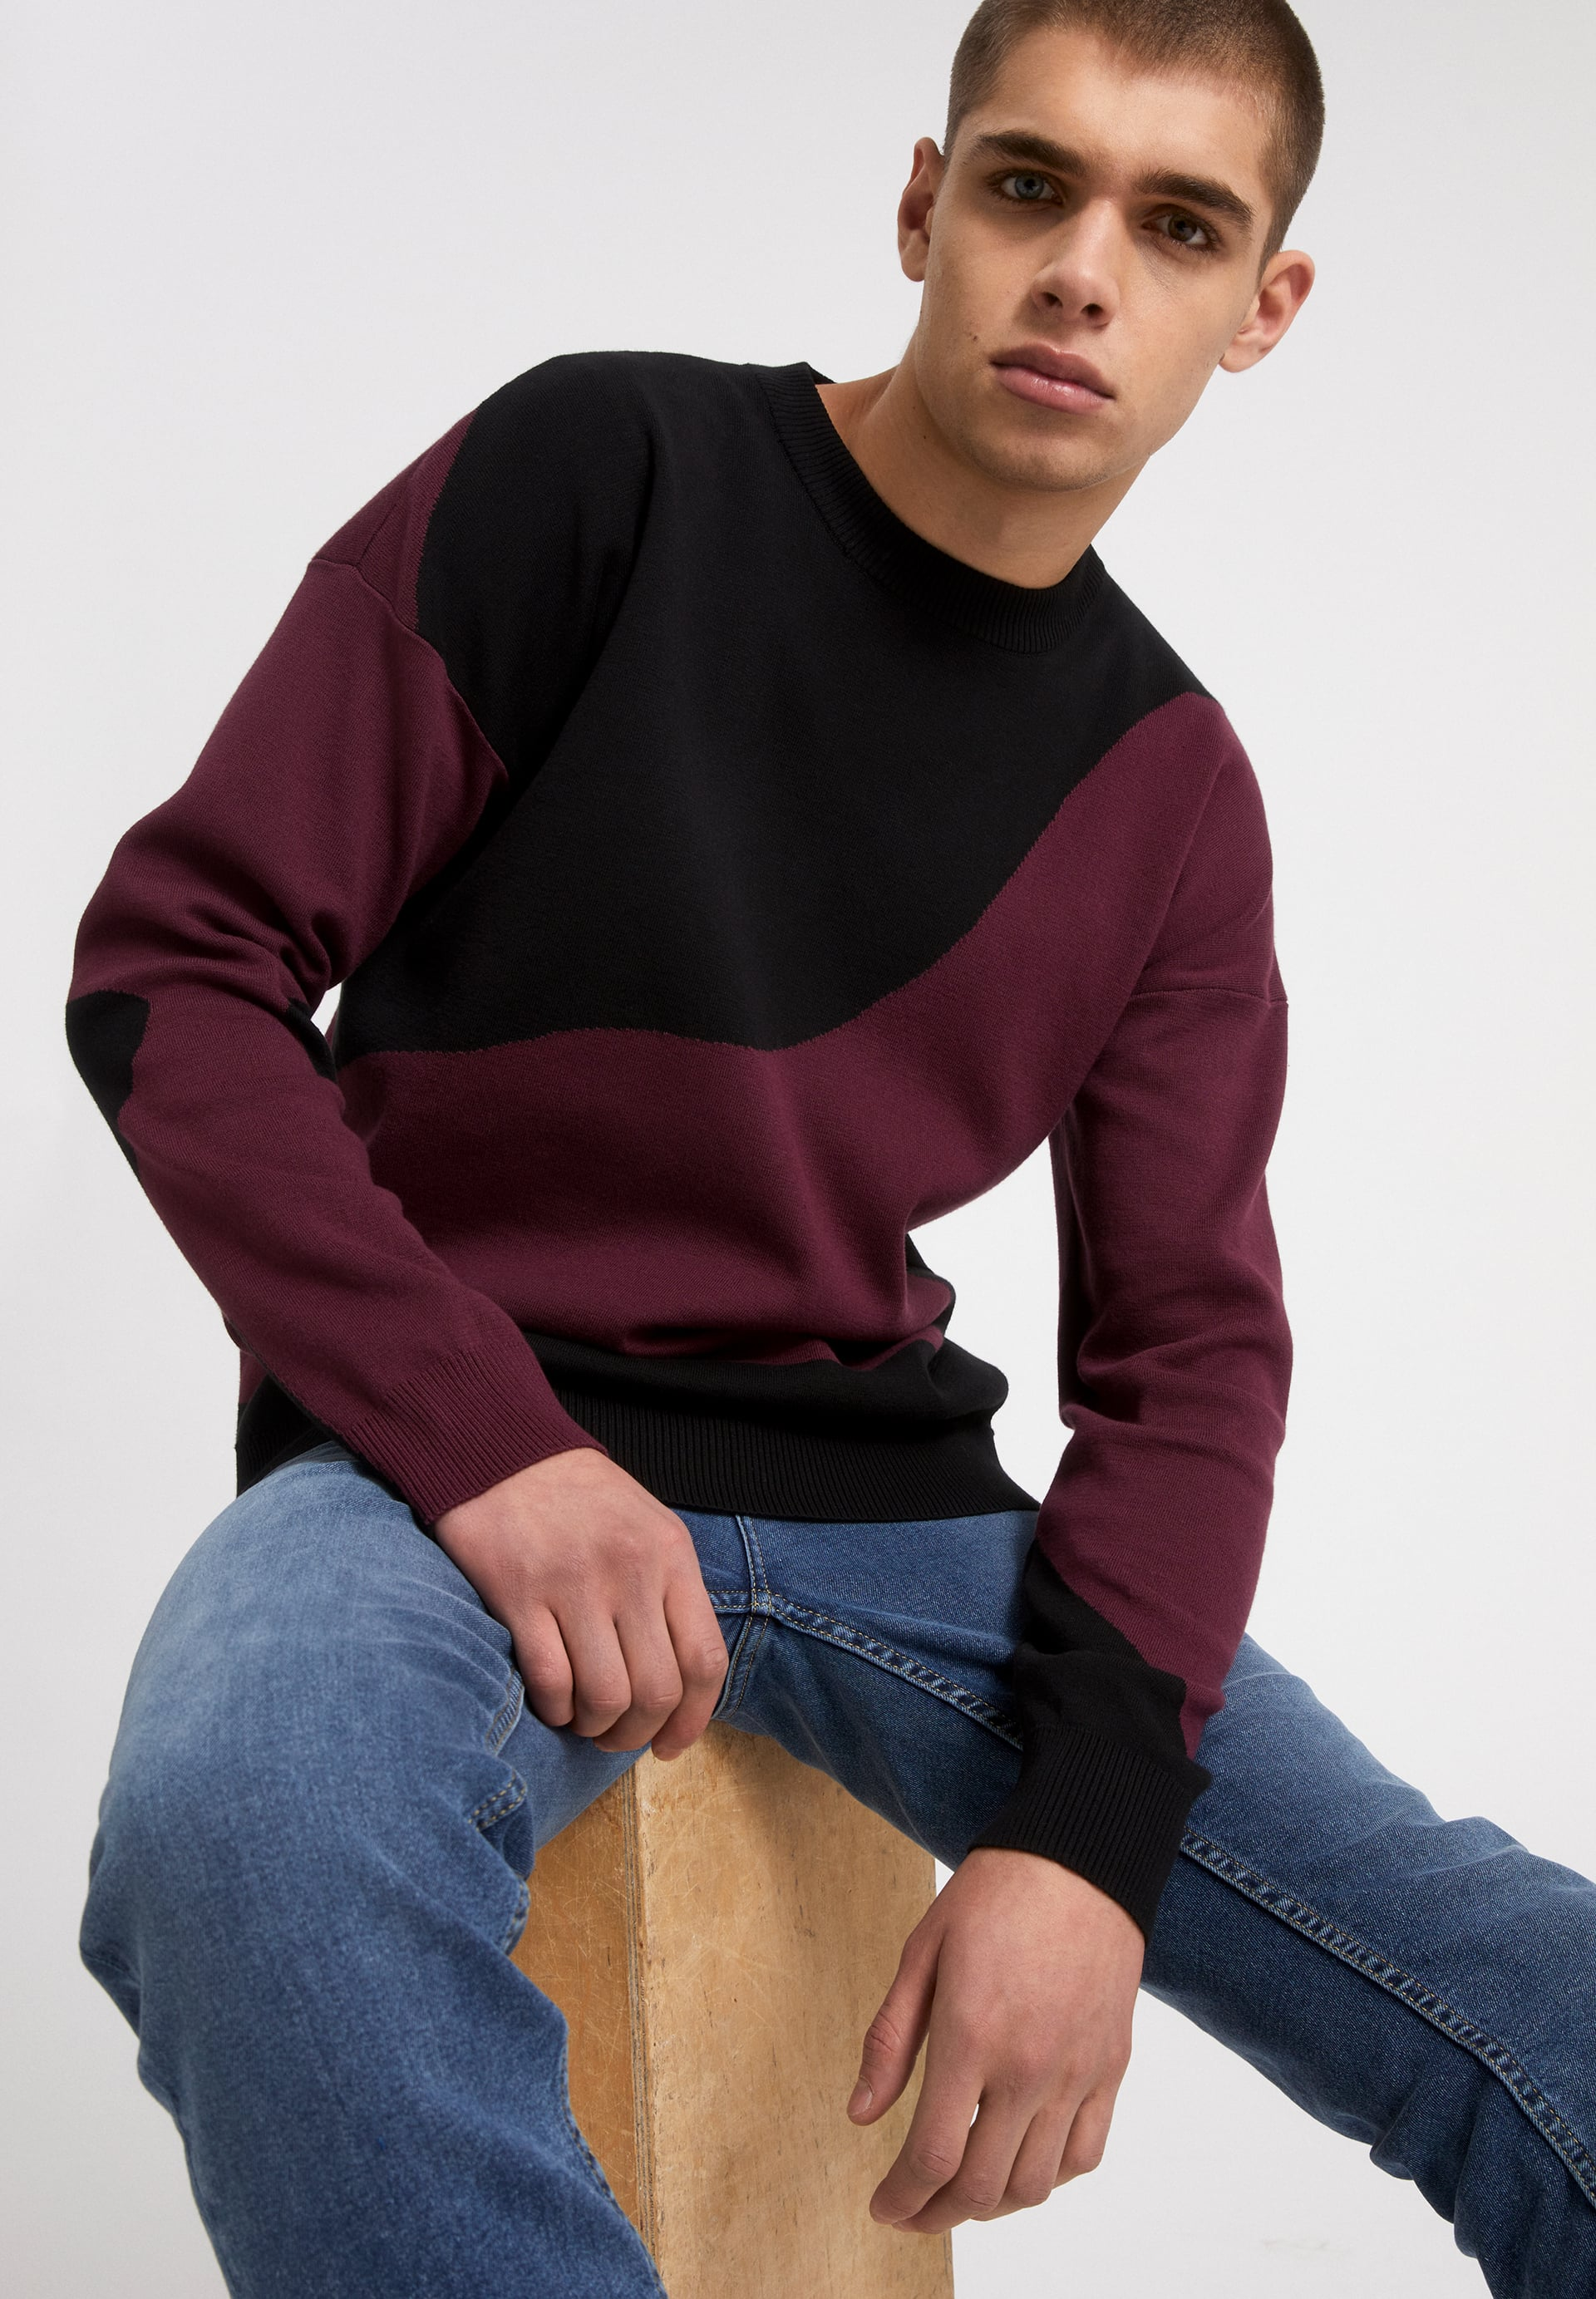 AARTO Sweater made of Organic Cotton